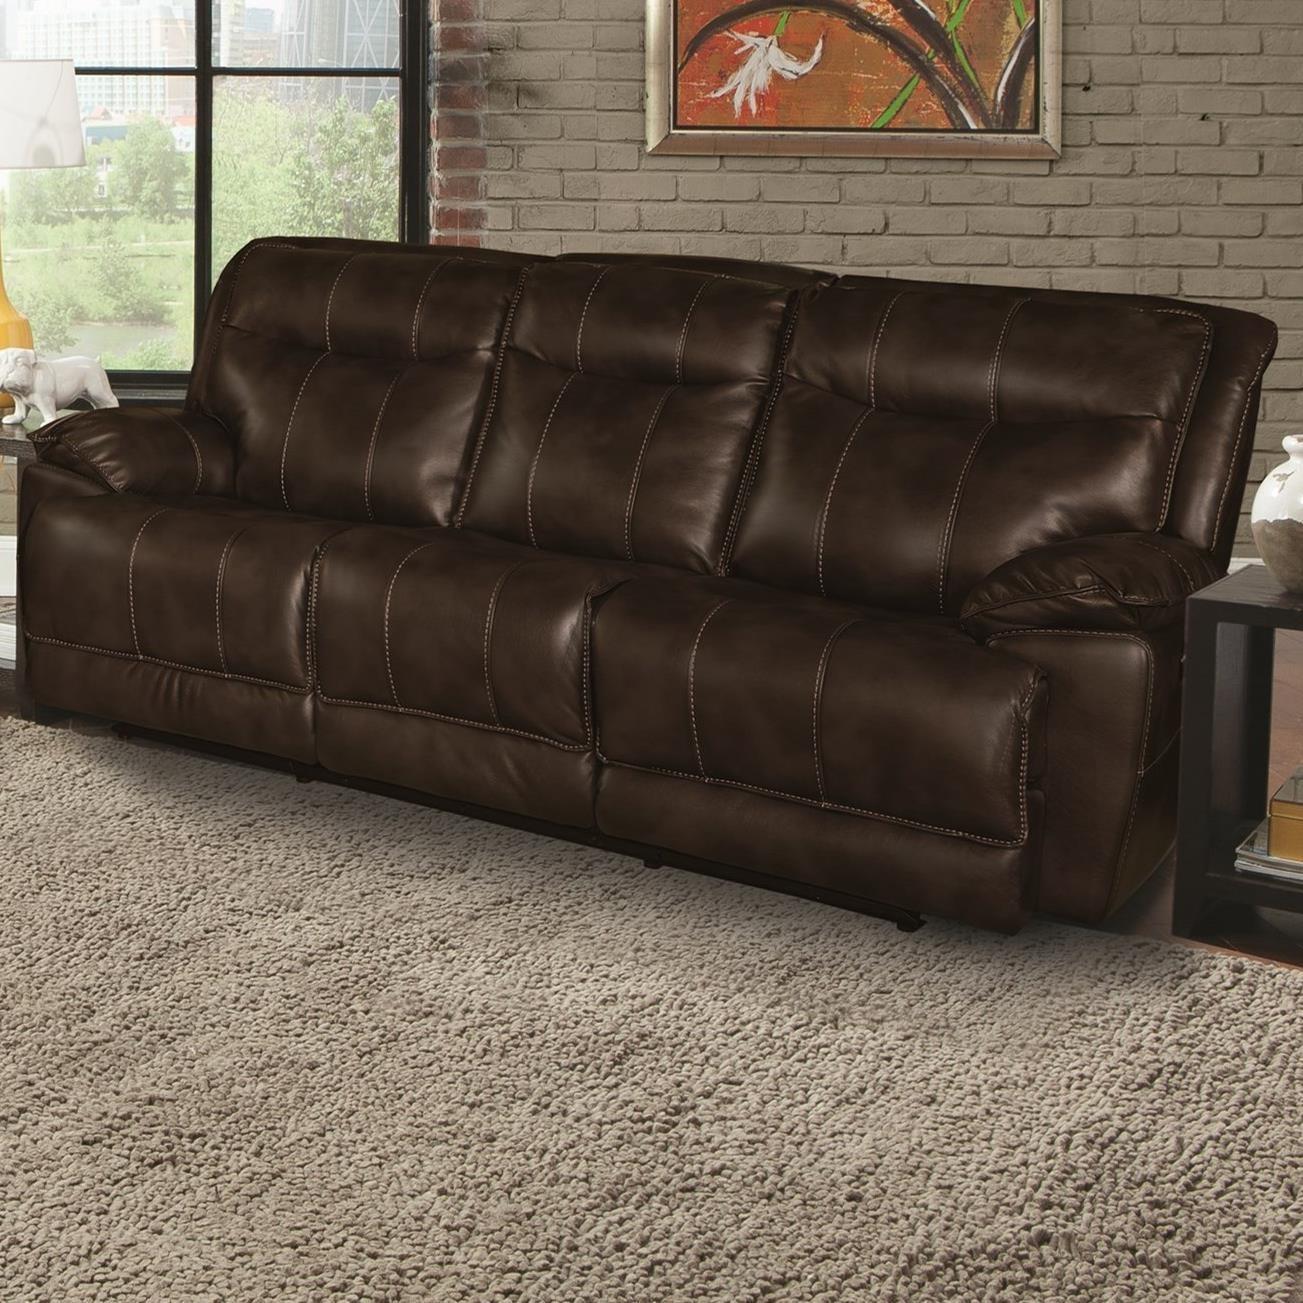 Parker Living Phoenix Dual Power Reclining Sofa - Item Number: MPHO-832P-TRU